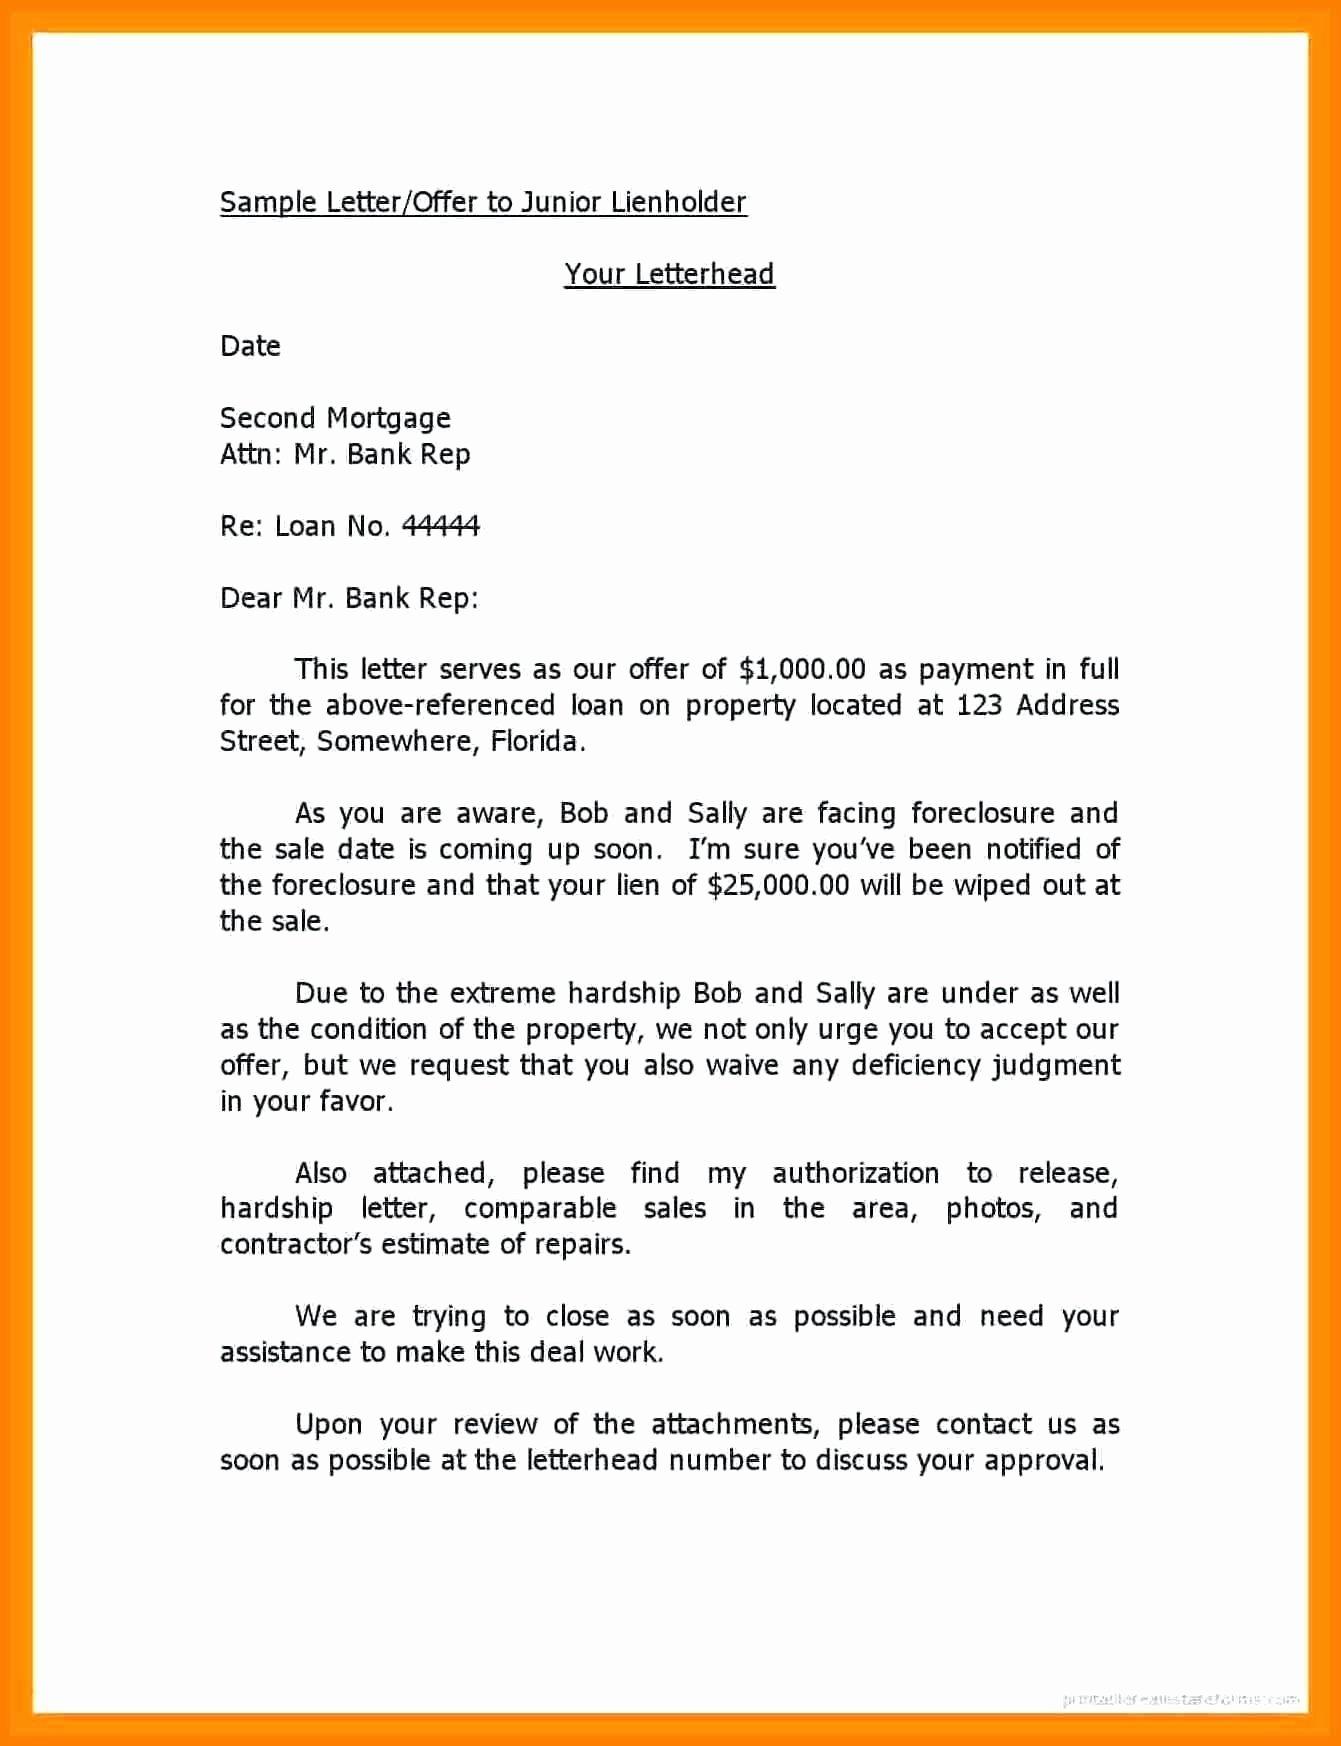 Lien Release Letter Template Luxury Notice Lien Letter Template Collection